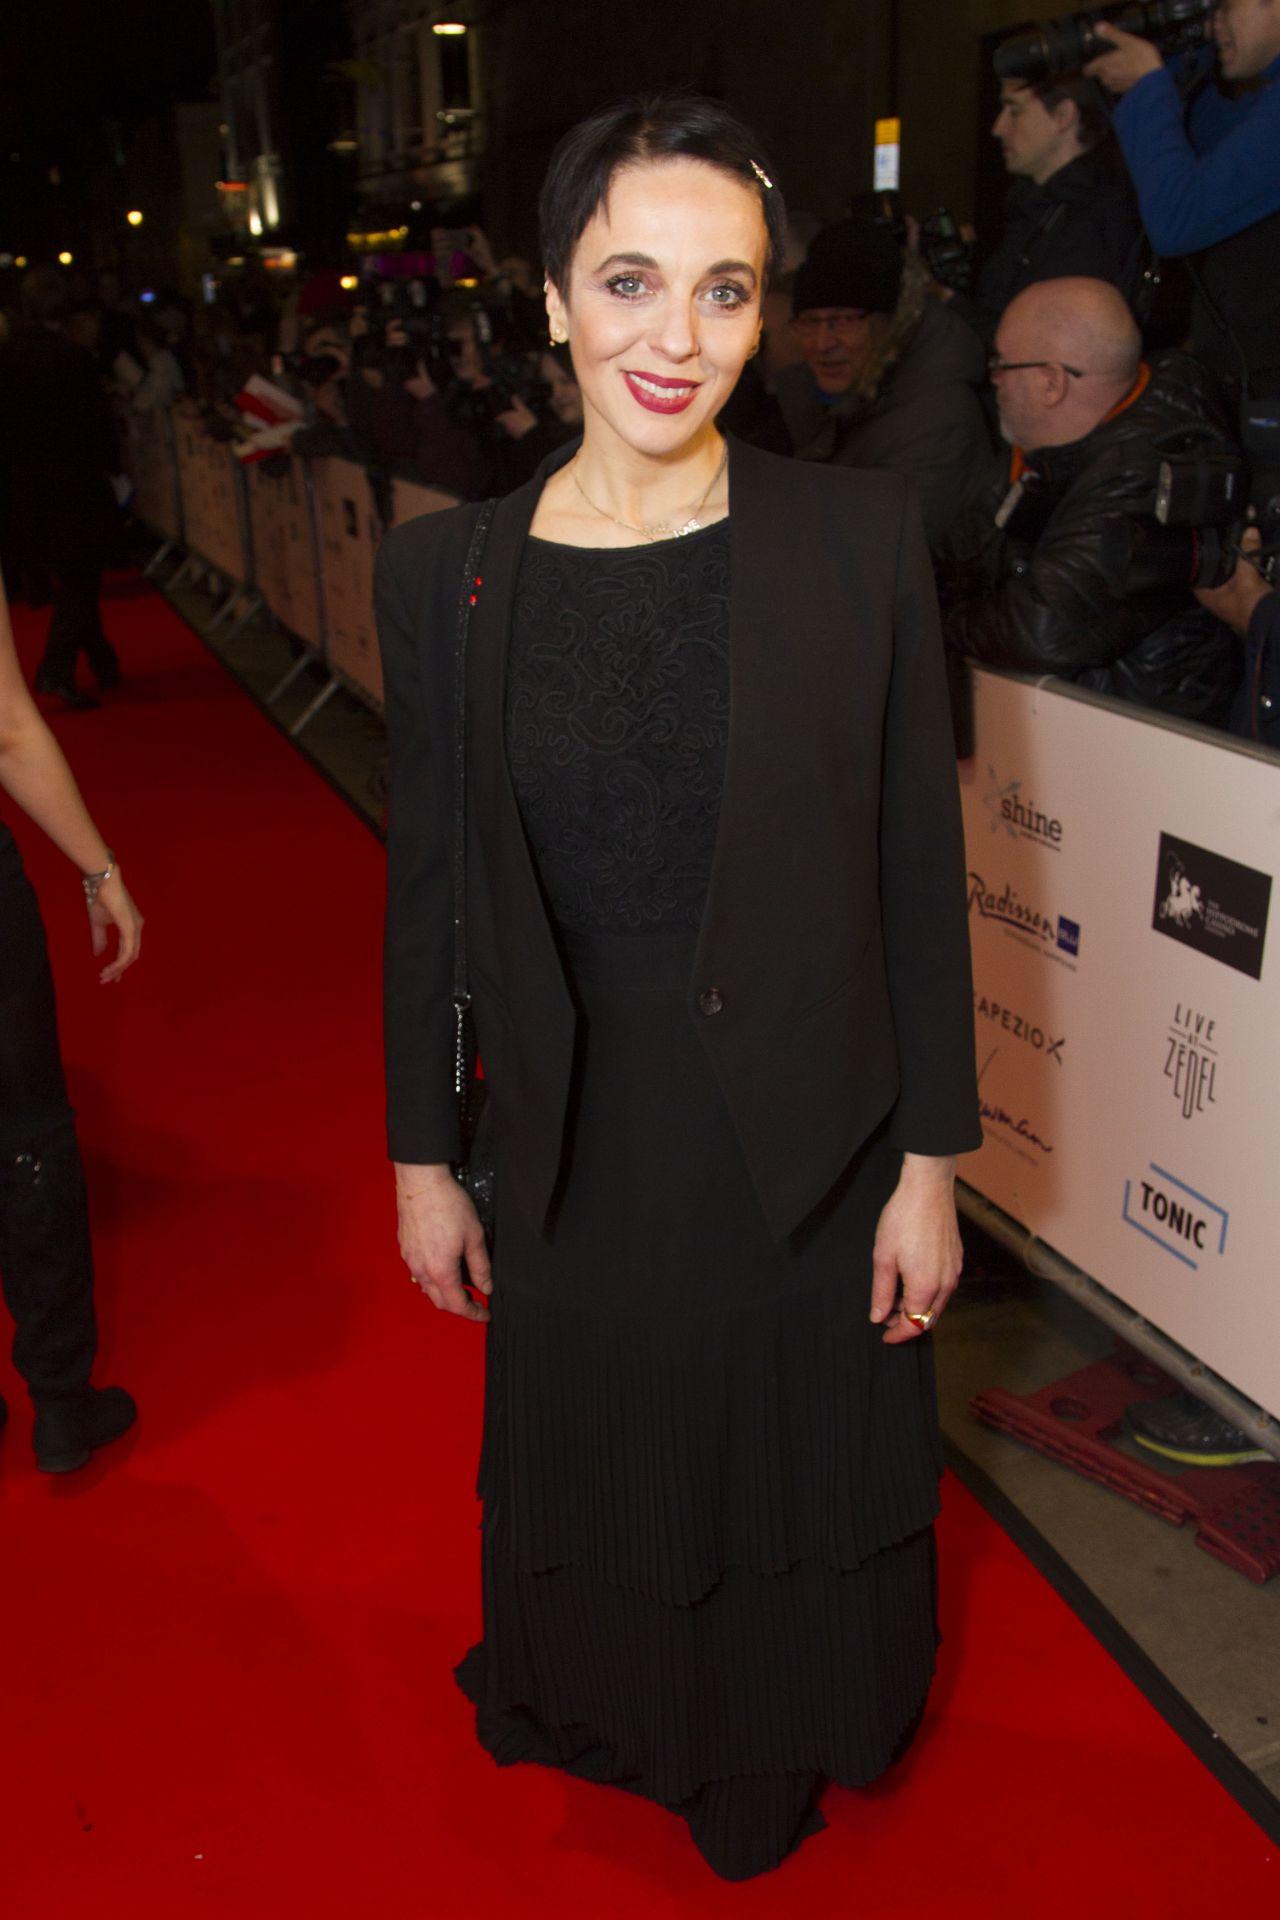 Amanda Abbington 17th Annual Whatsonstage Awards In